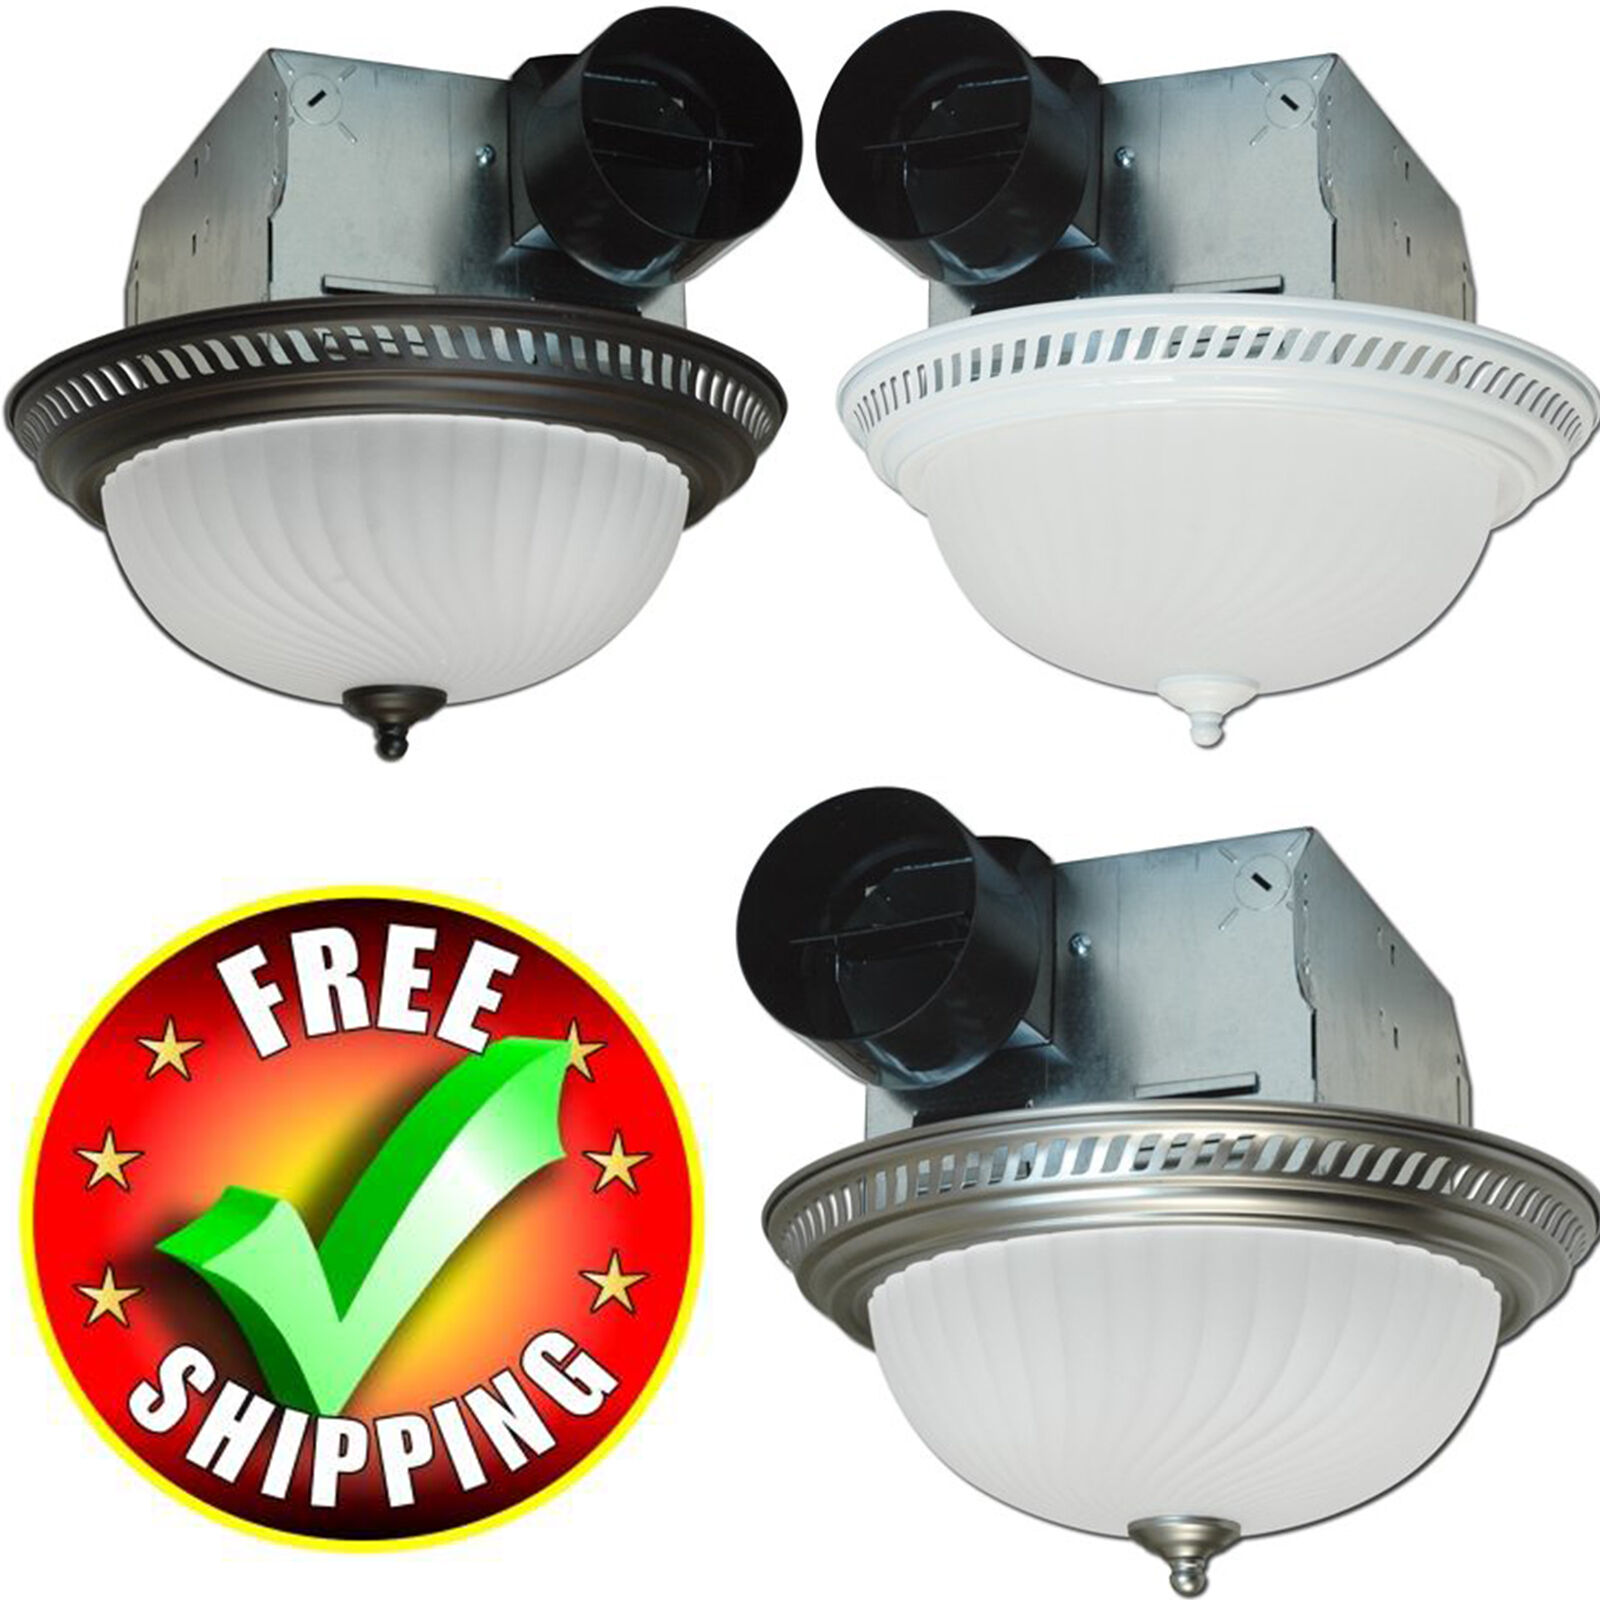 Bath Fan Light Round Bathroom Exhaust Ventilation Vent Ceili